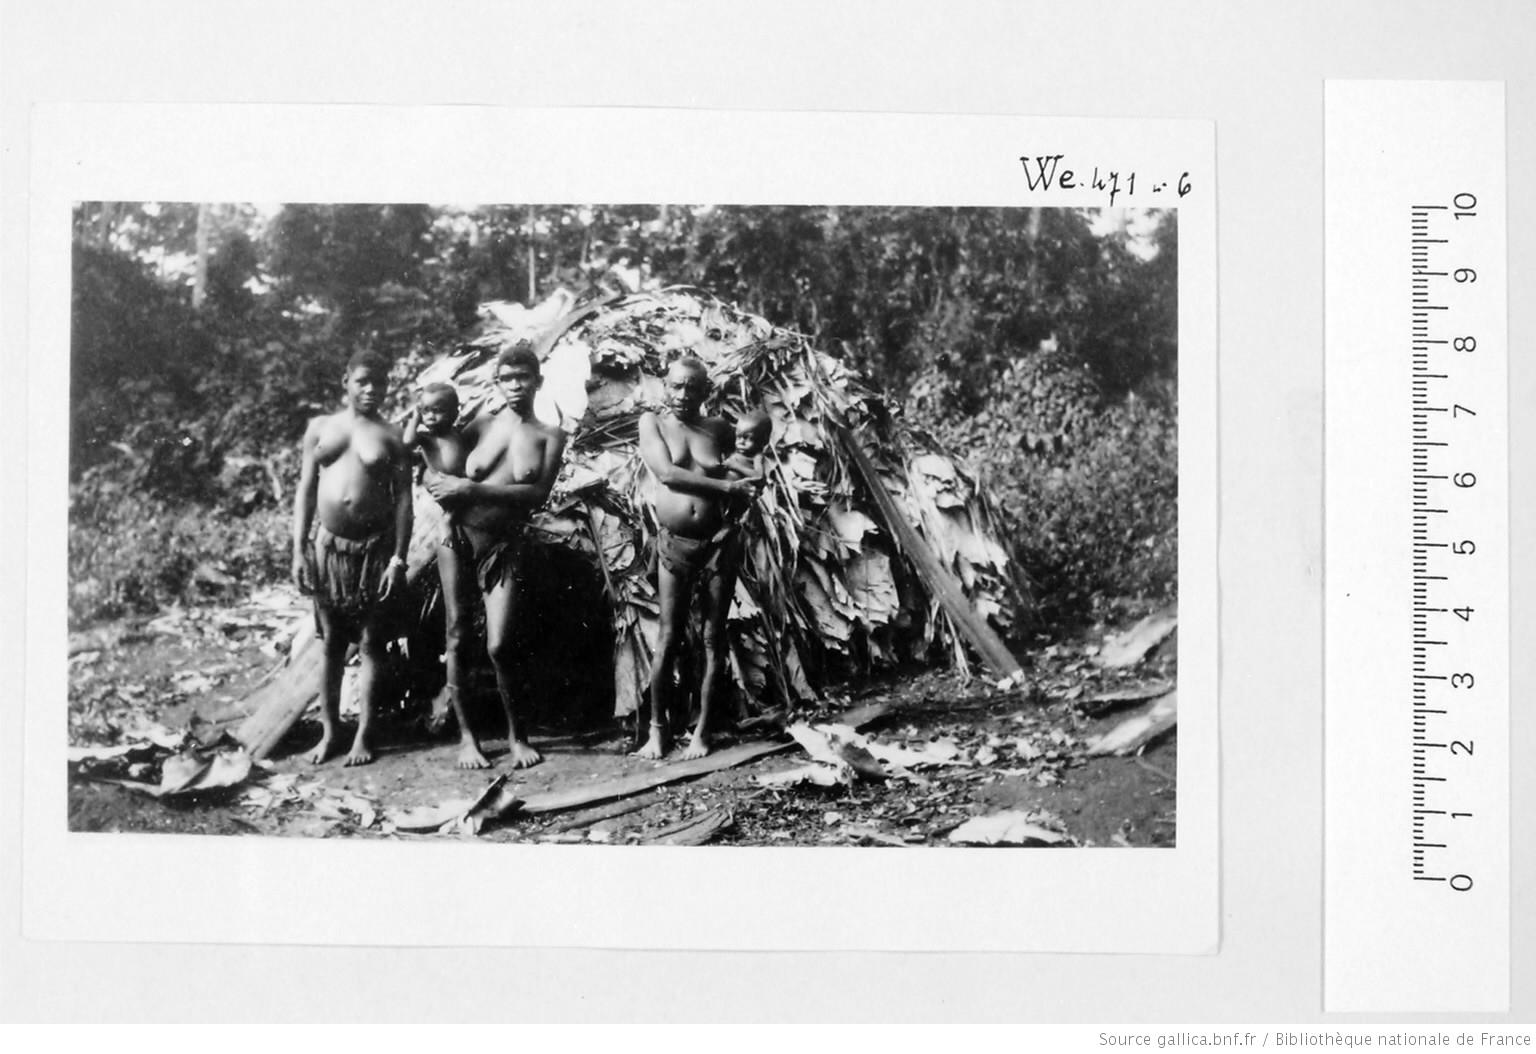 [39 phot. d'A.E.F. en 1924. Enregistré en 1936] - 6